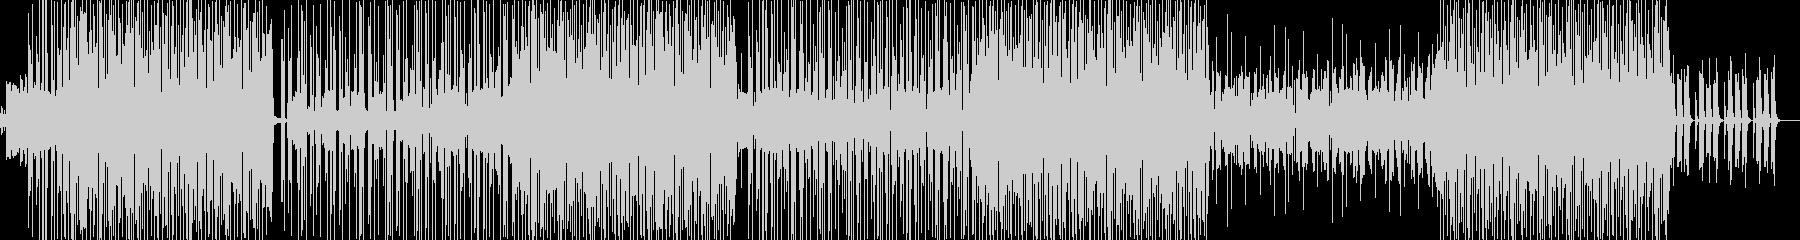 HIPHOPトラック ノリノリ系の未再生の波形